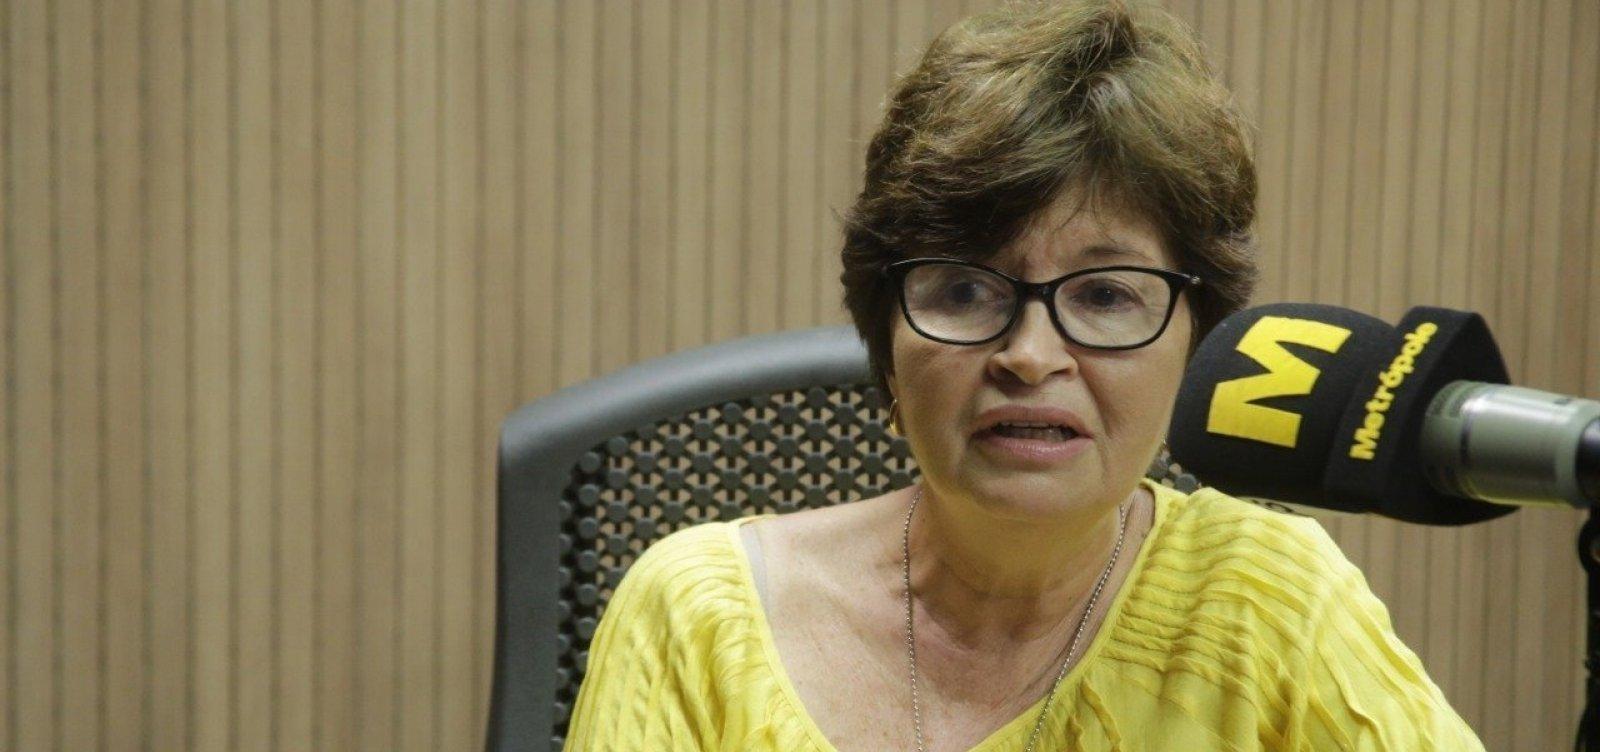 Superintendente da Osid receberá Medalha Irmã Dulce na Câmara Municipal